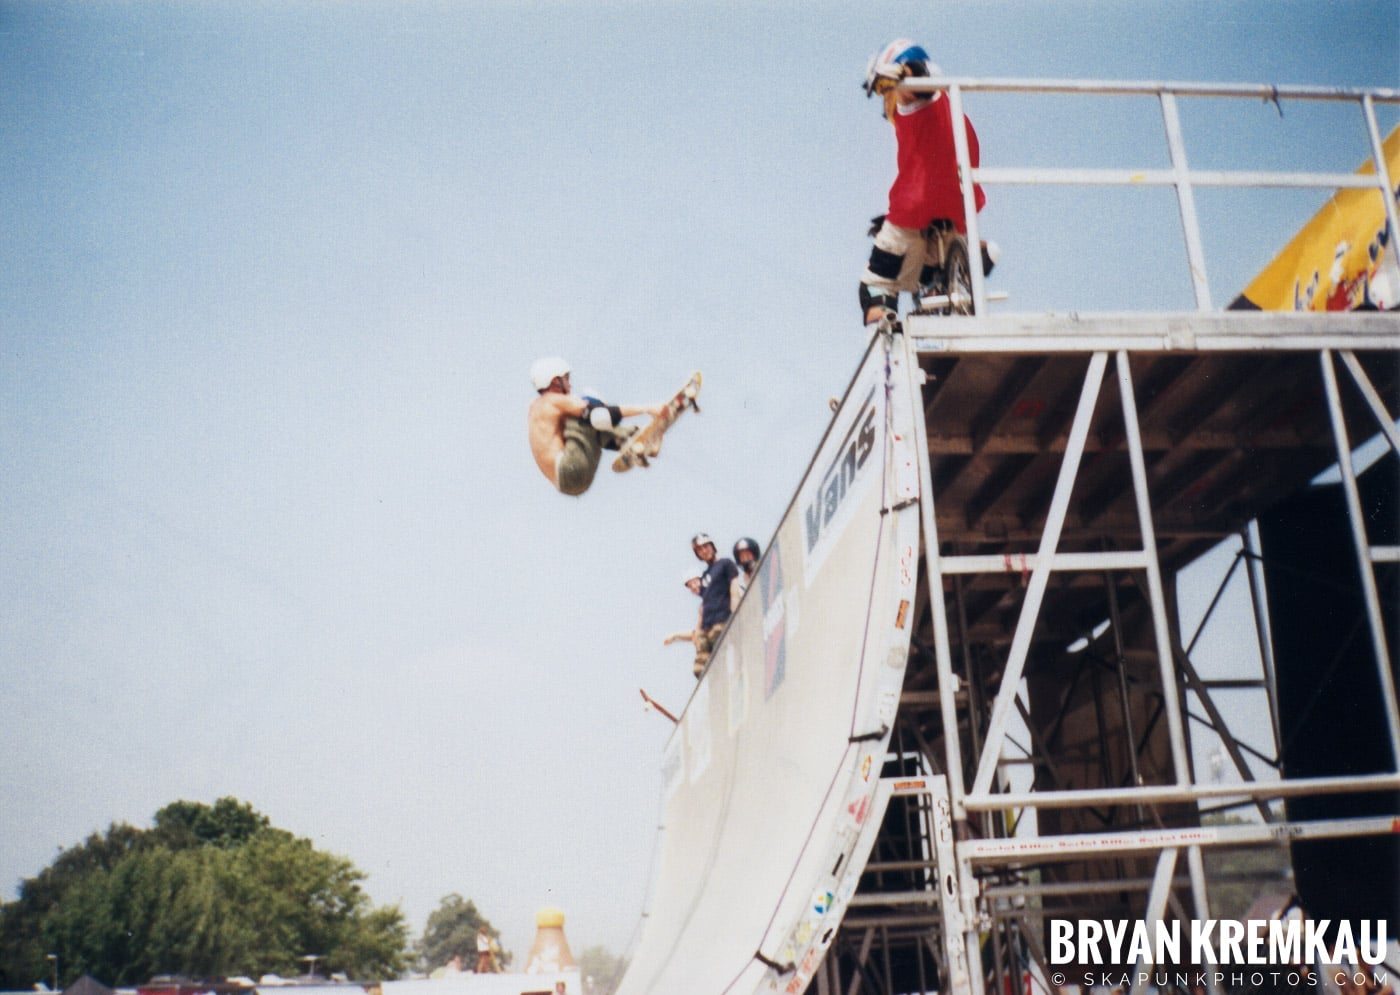 Skaters @ Vans Warped Tour, Randall's Island, NYC - 7.16.99 (5)